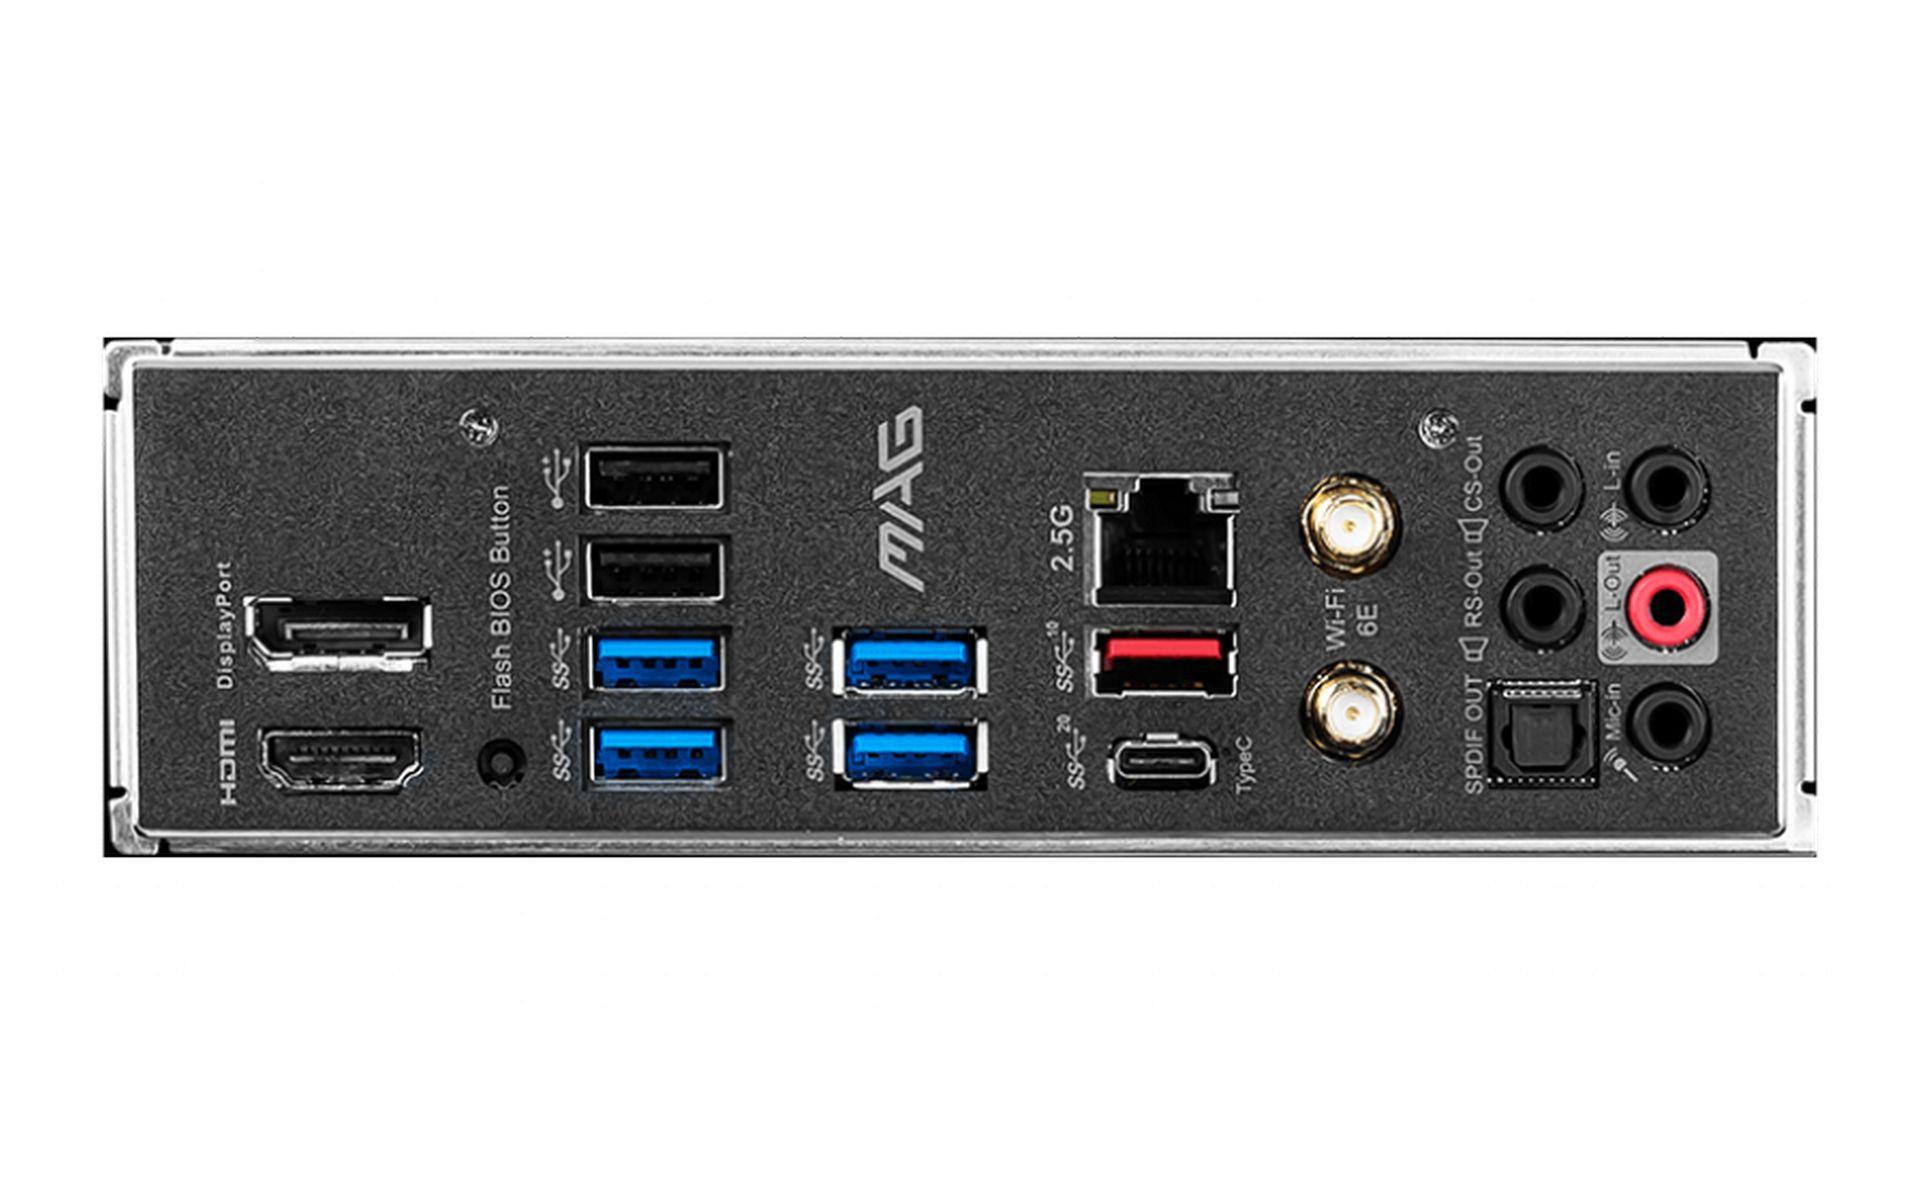 MSI MAG Z590 TOMAHAWK WIFI USB 3.2 GEN 2x2 20G